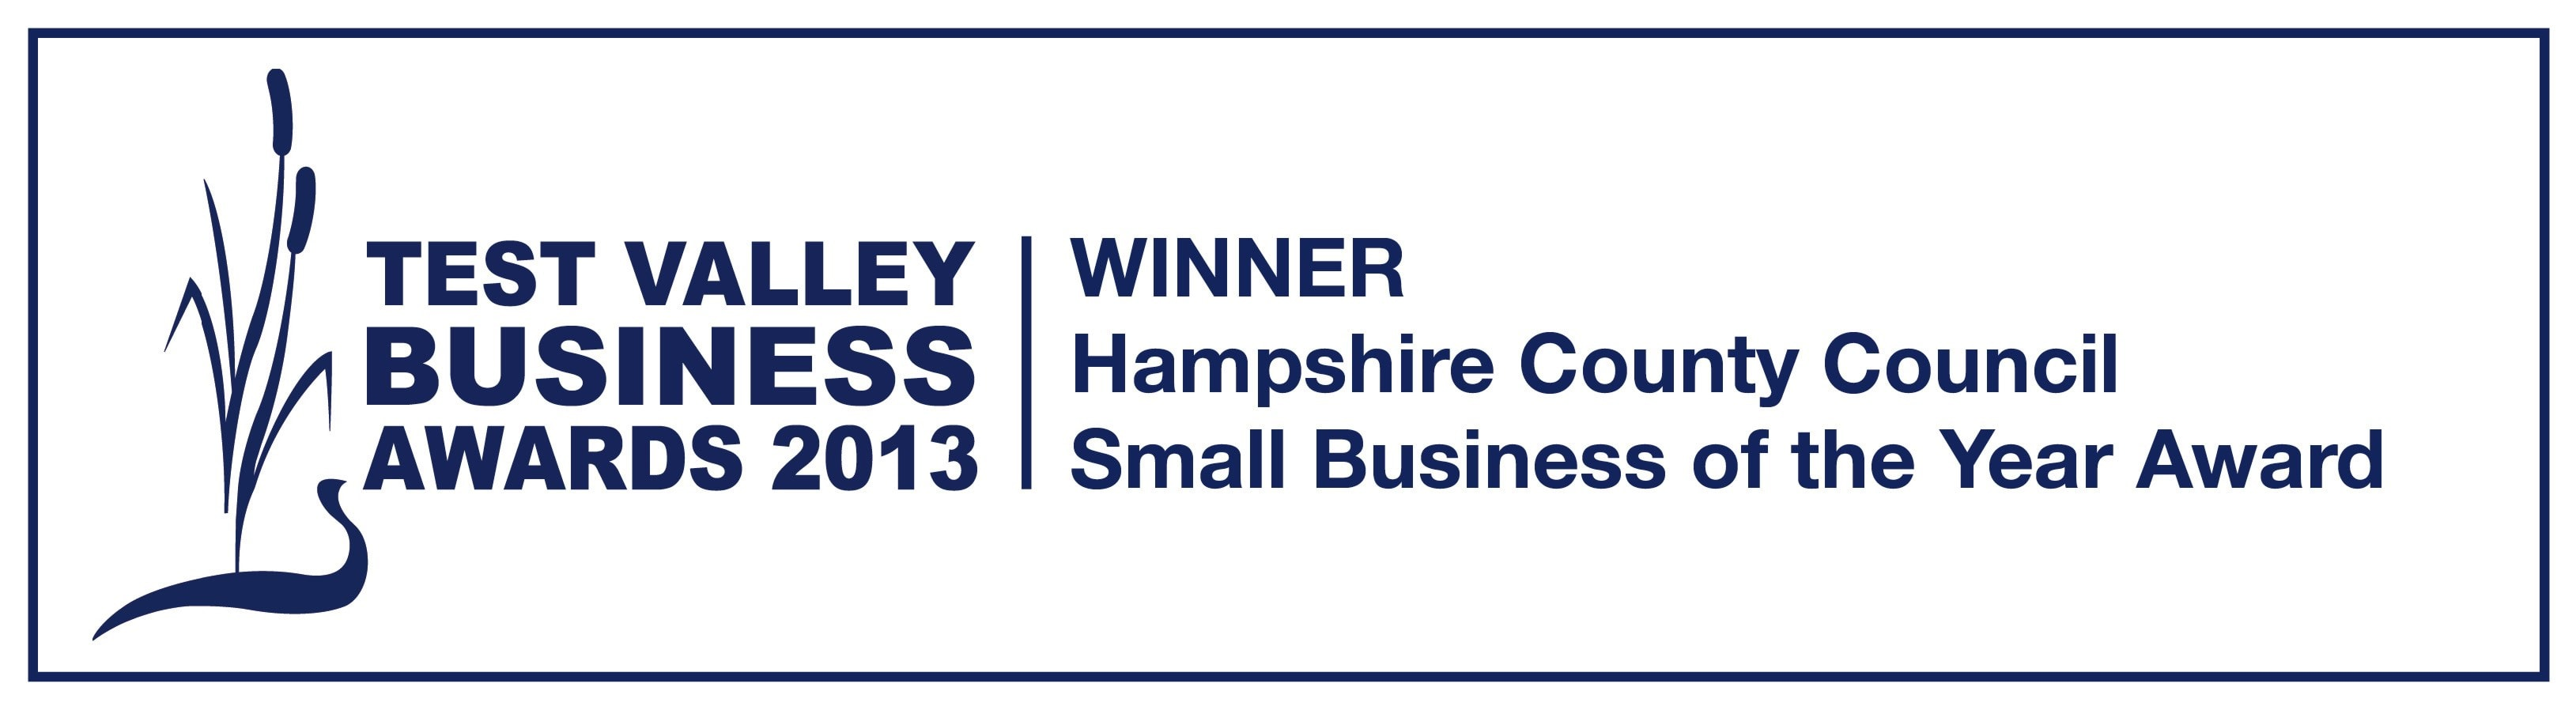 Test Valley business winner 2013